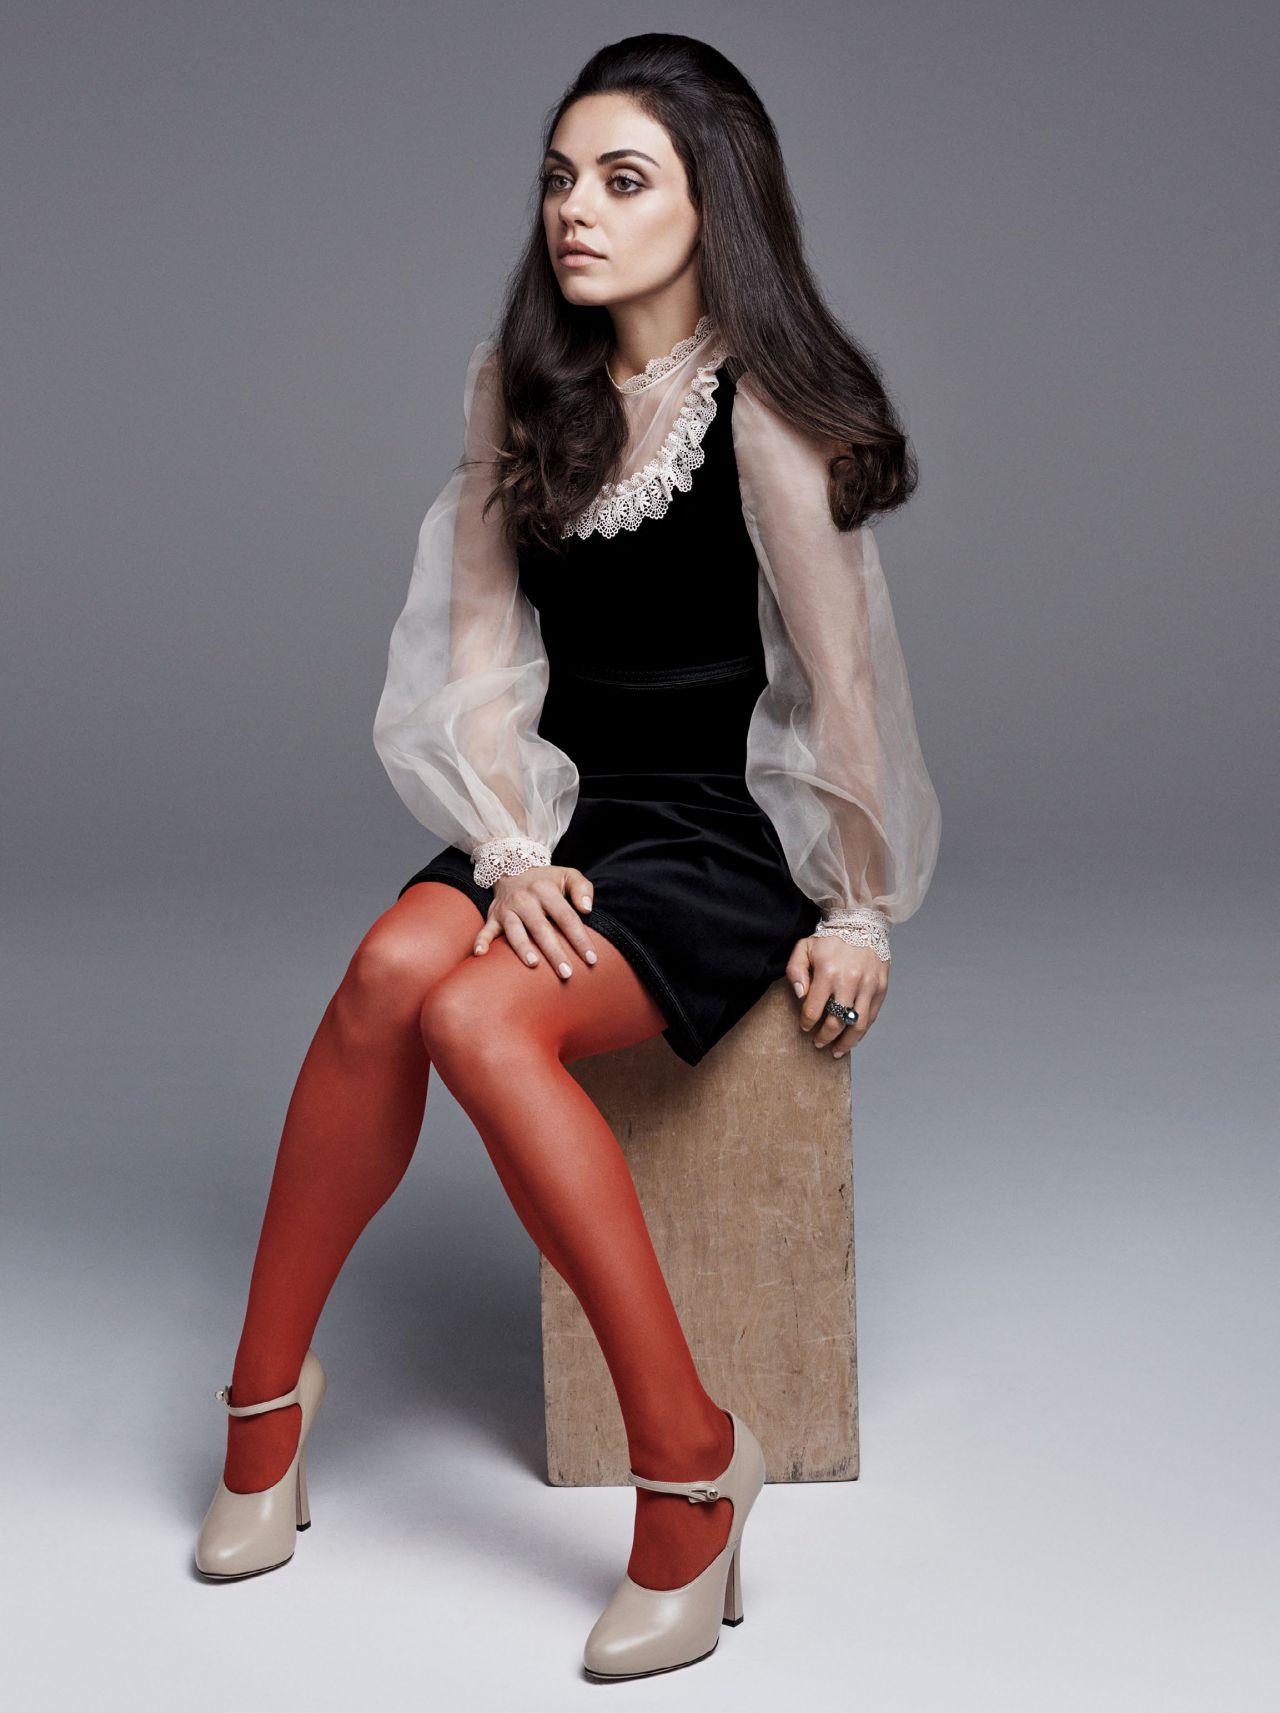 Mila Kunis Photoshoot For Us Glamour August 2016